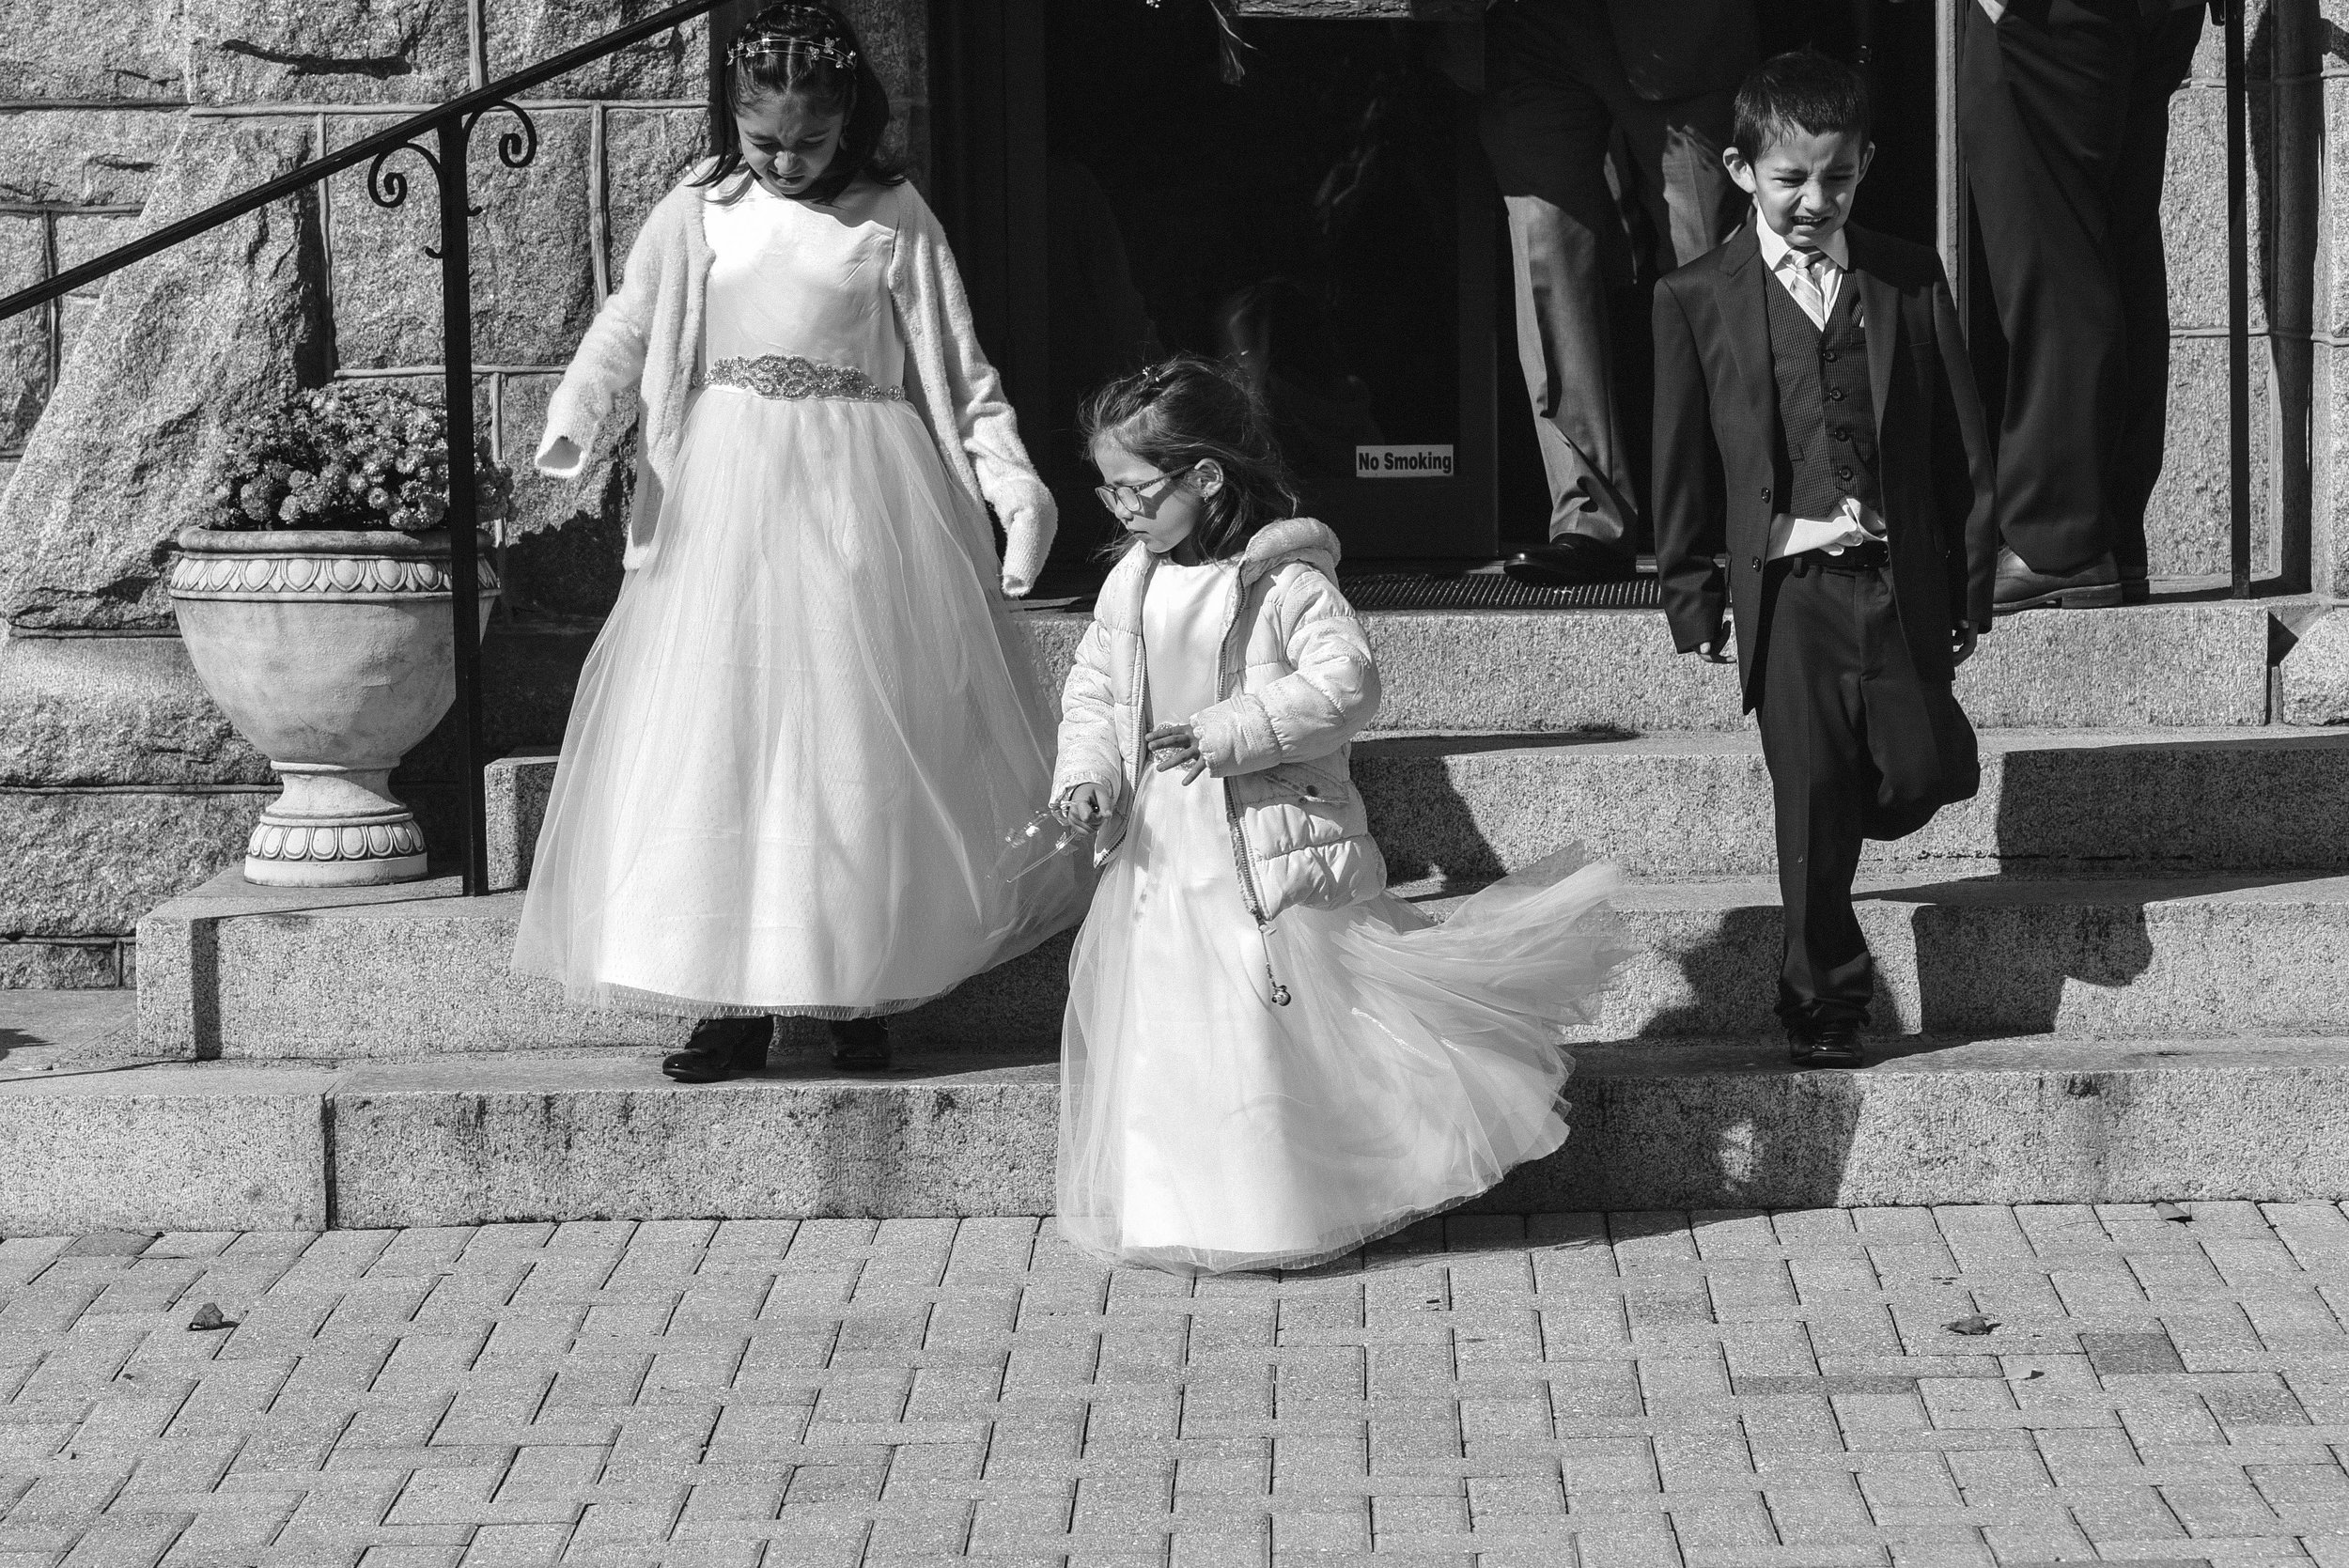 maryland_wedding_photographer_st.augustine_church-14.jpg